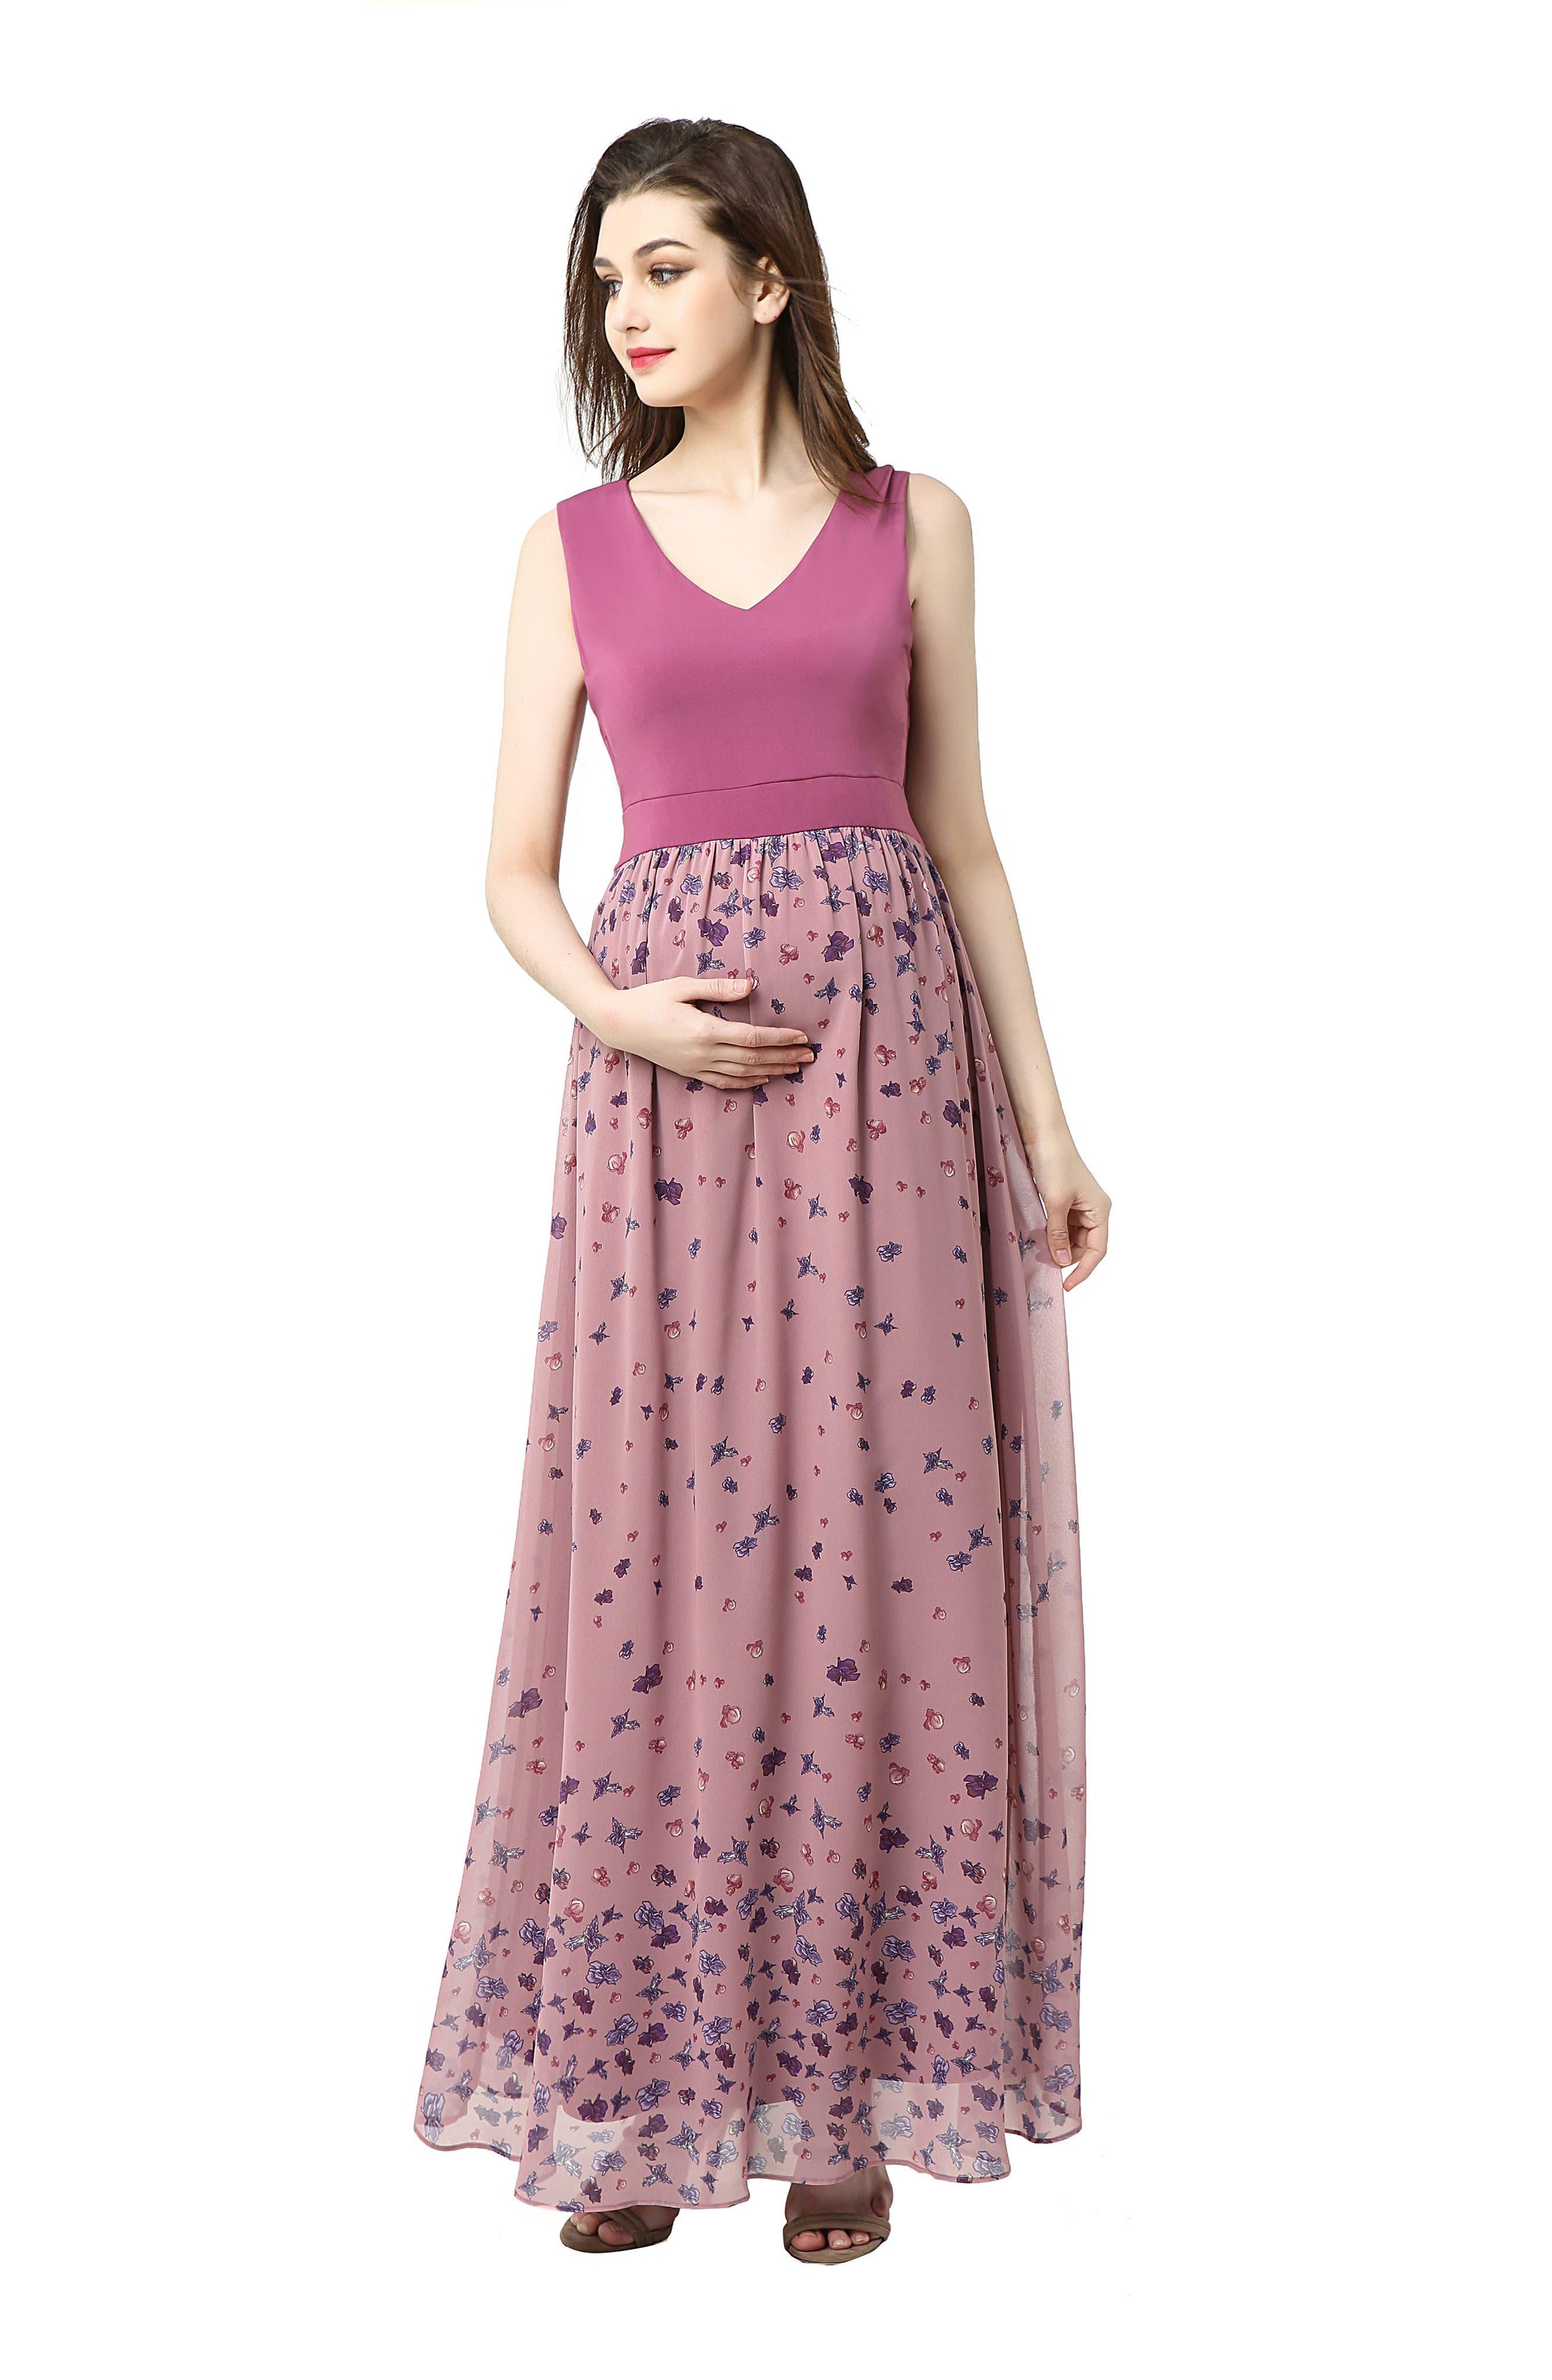 Armanda Maternity Maxi Dress,                             Alternate thumbnail 5, color,                             ROSE PINK